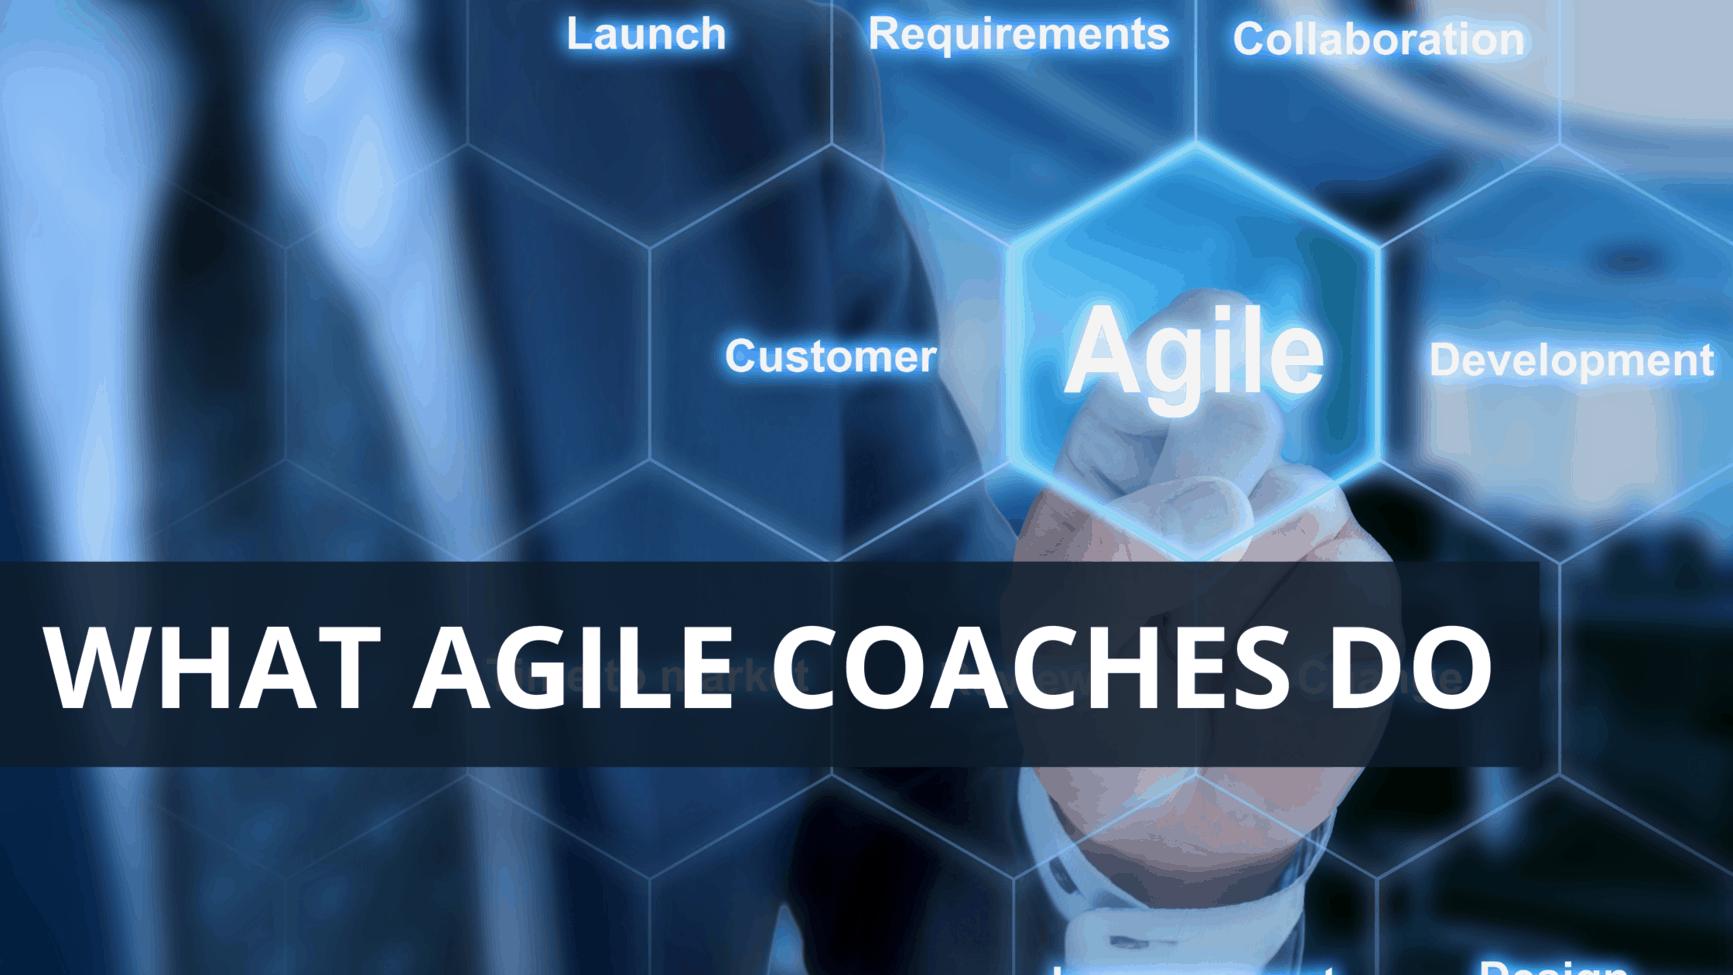 What Agile Coaches Do